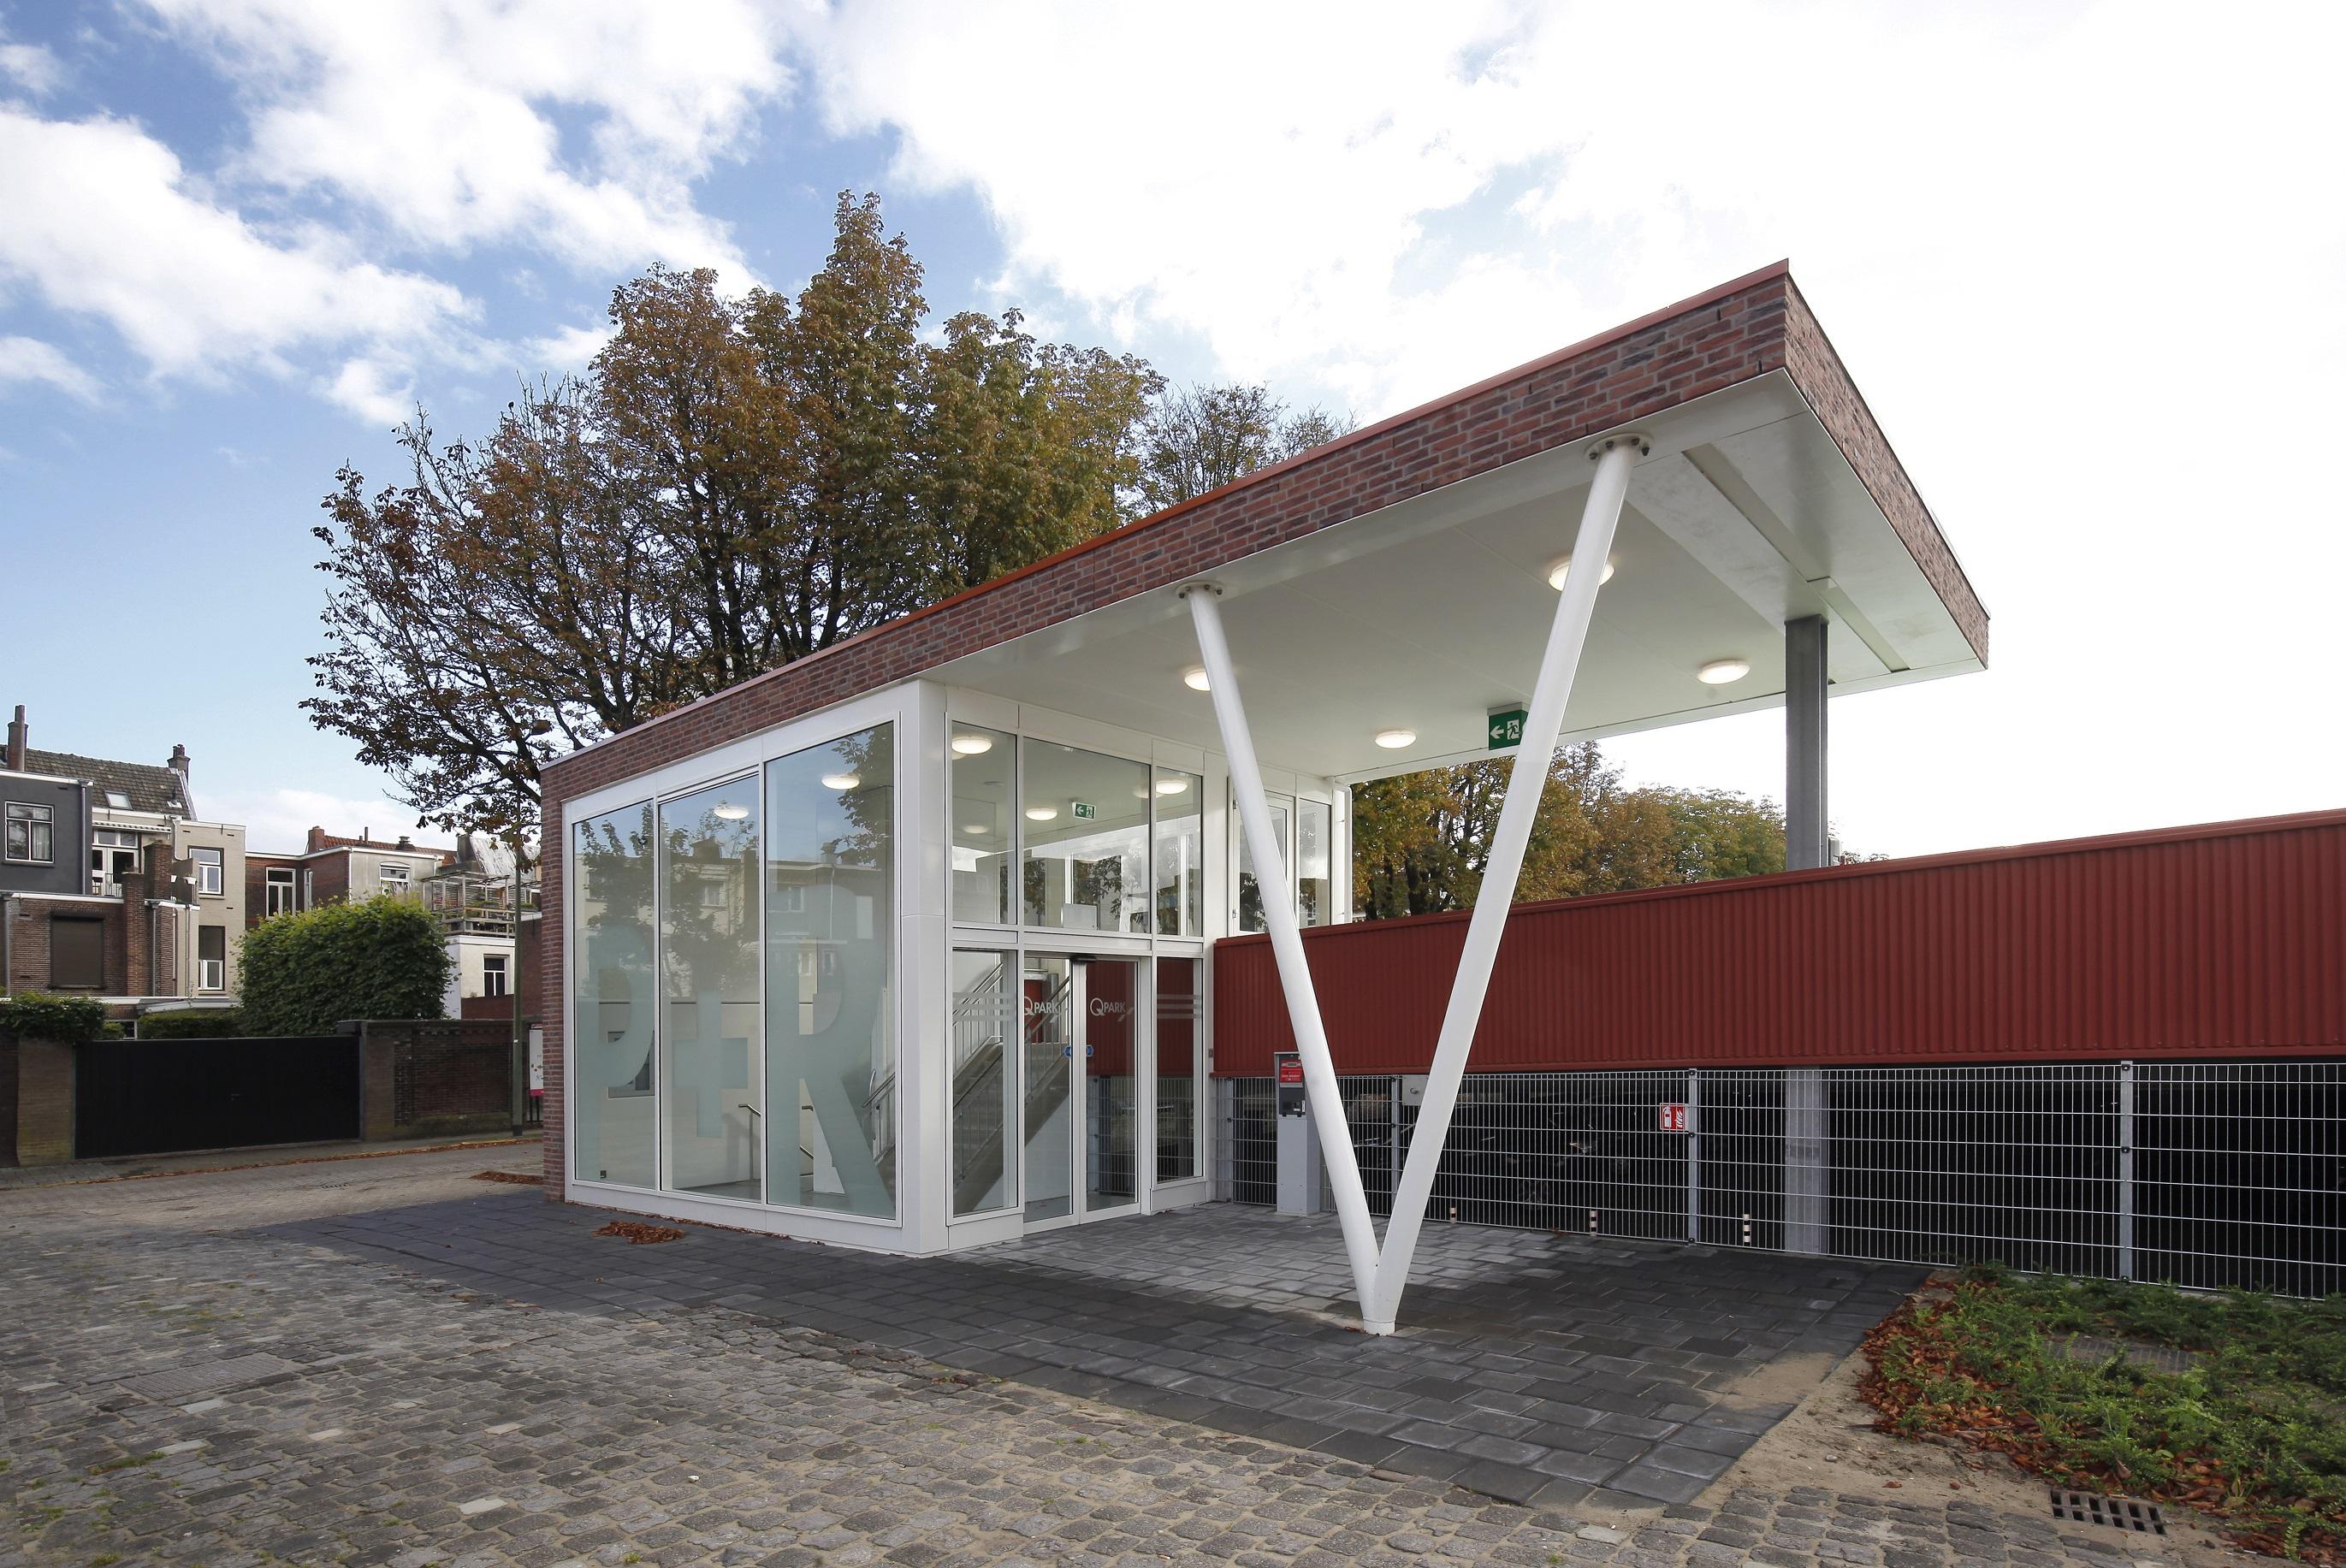 P+R 's-Hertogenbosch